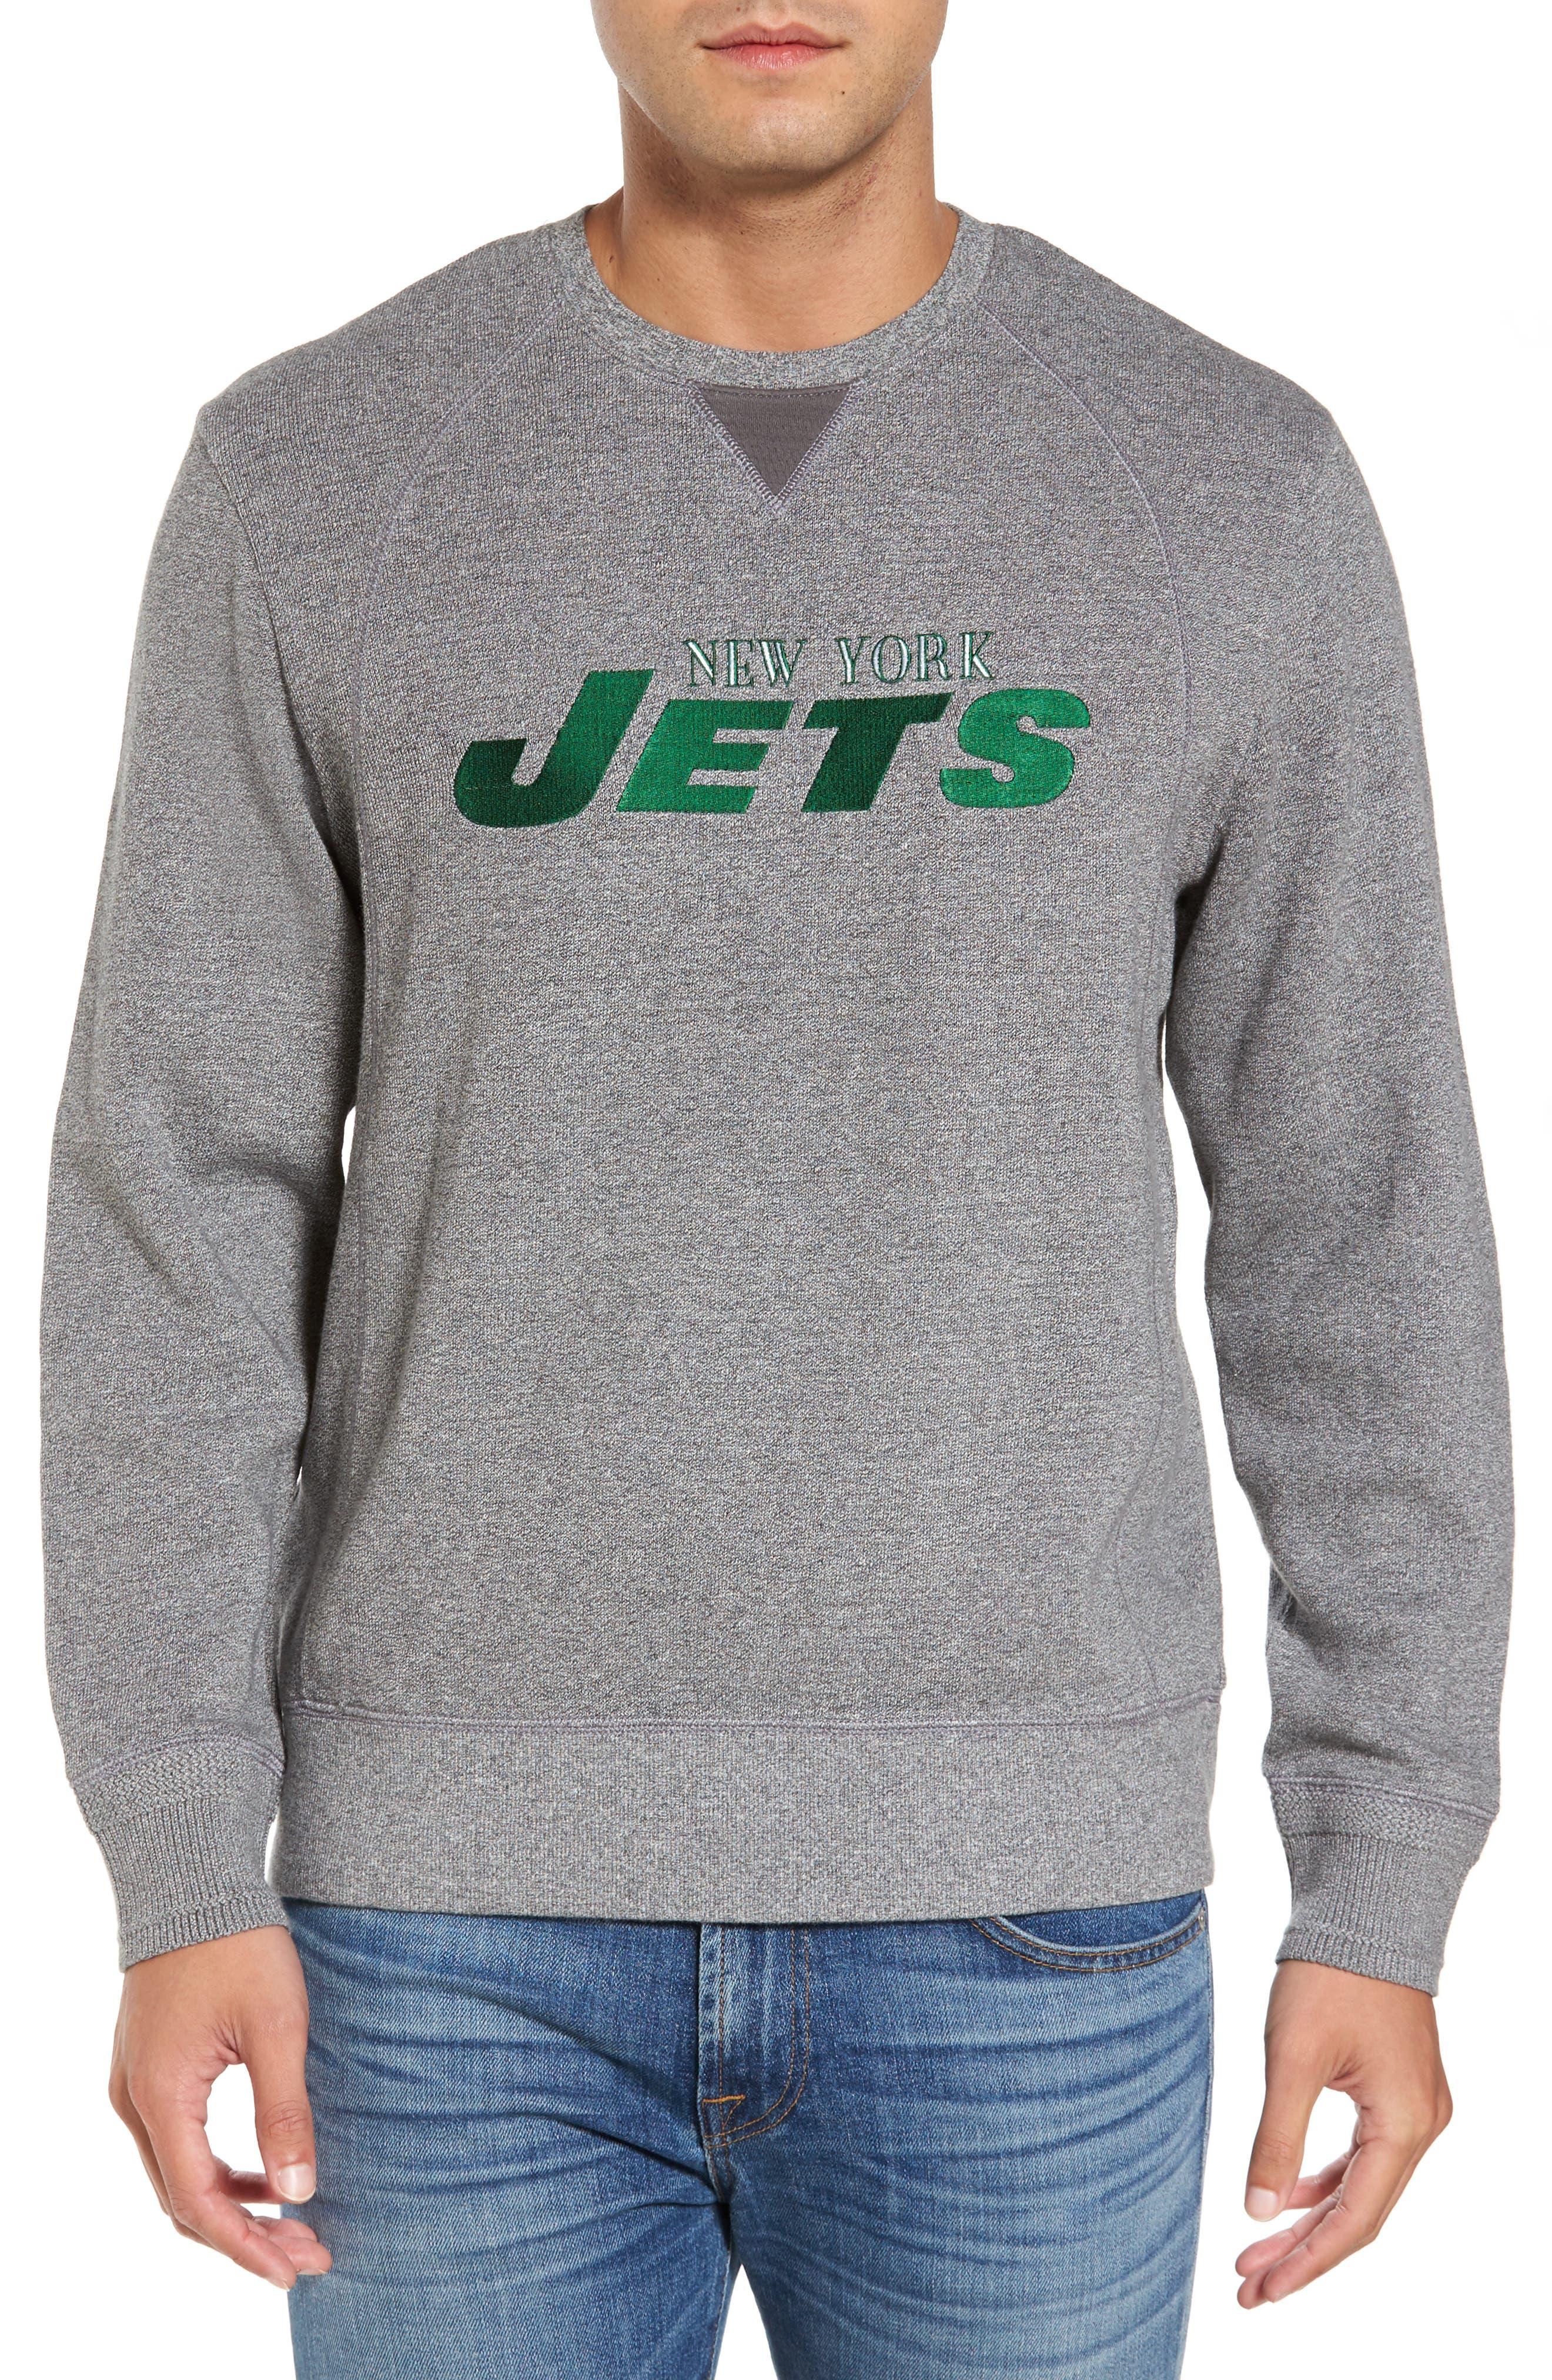 NFL Stitch of Liberty Embroidered Crewneck Sweatshirt,                             Main thumbnail 17, color,